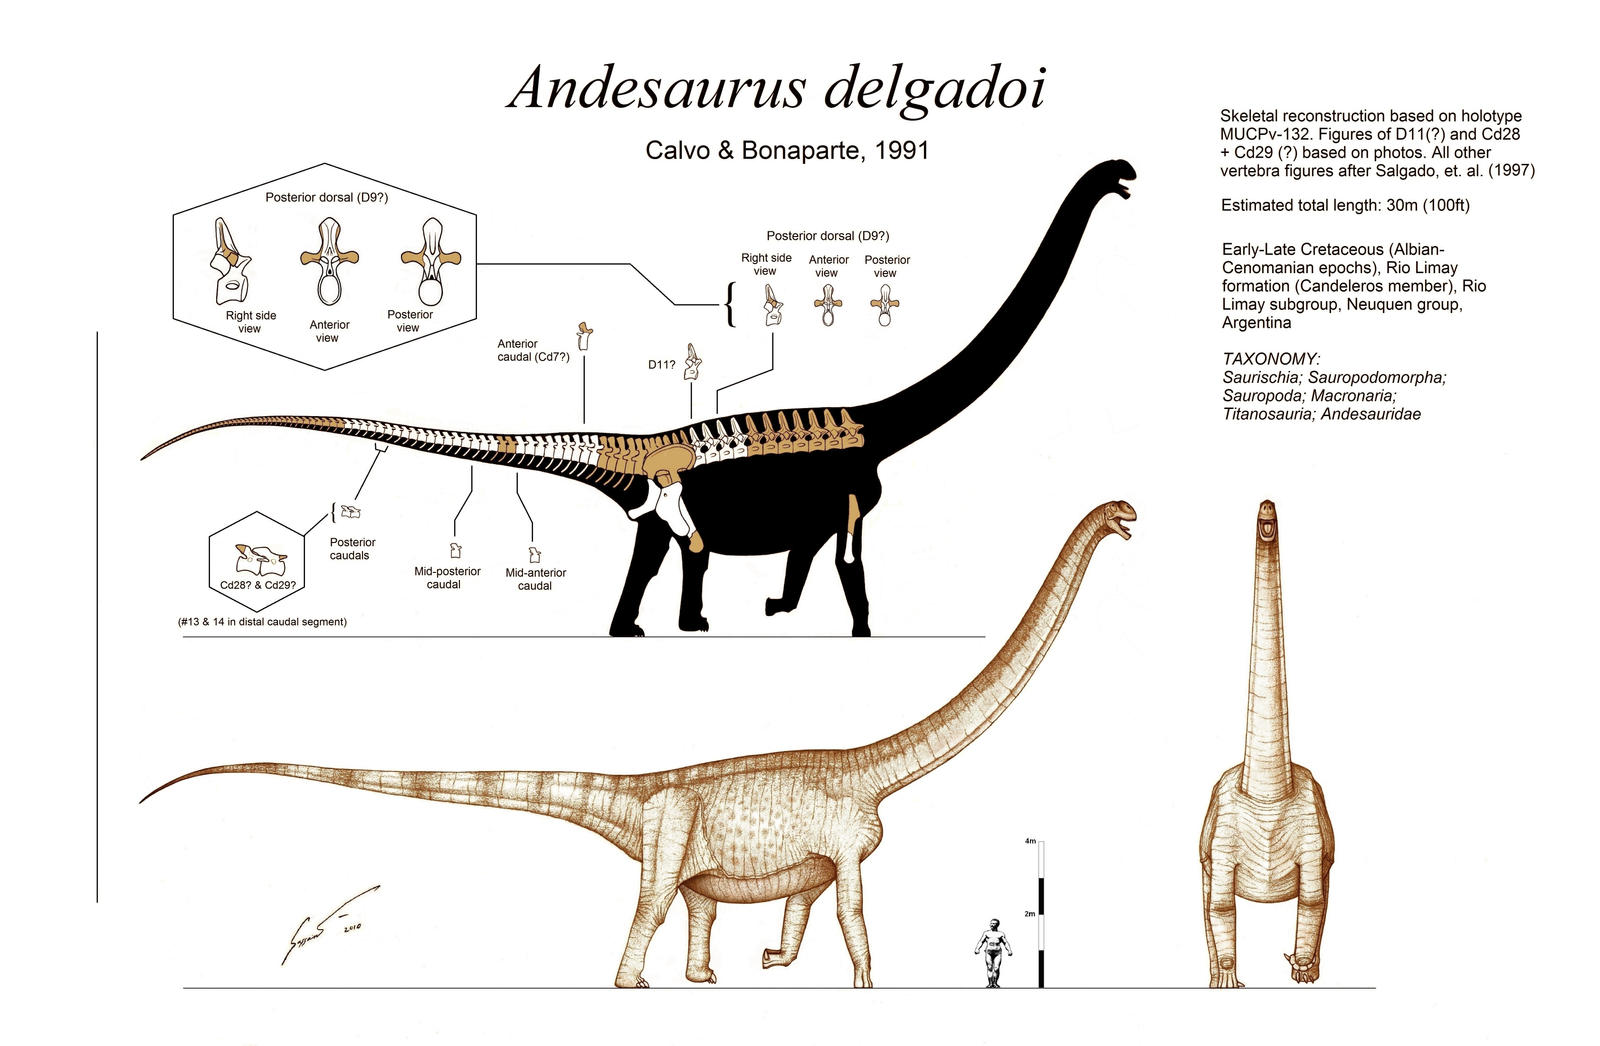 Andesaurus delgadoi by Paleo-King